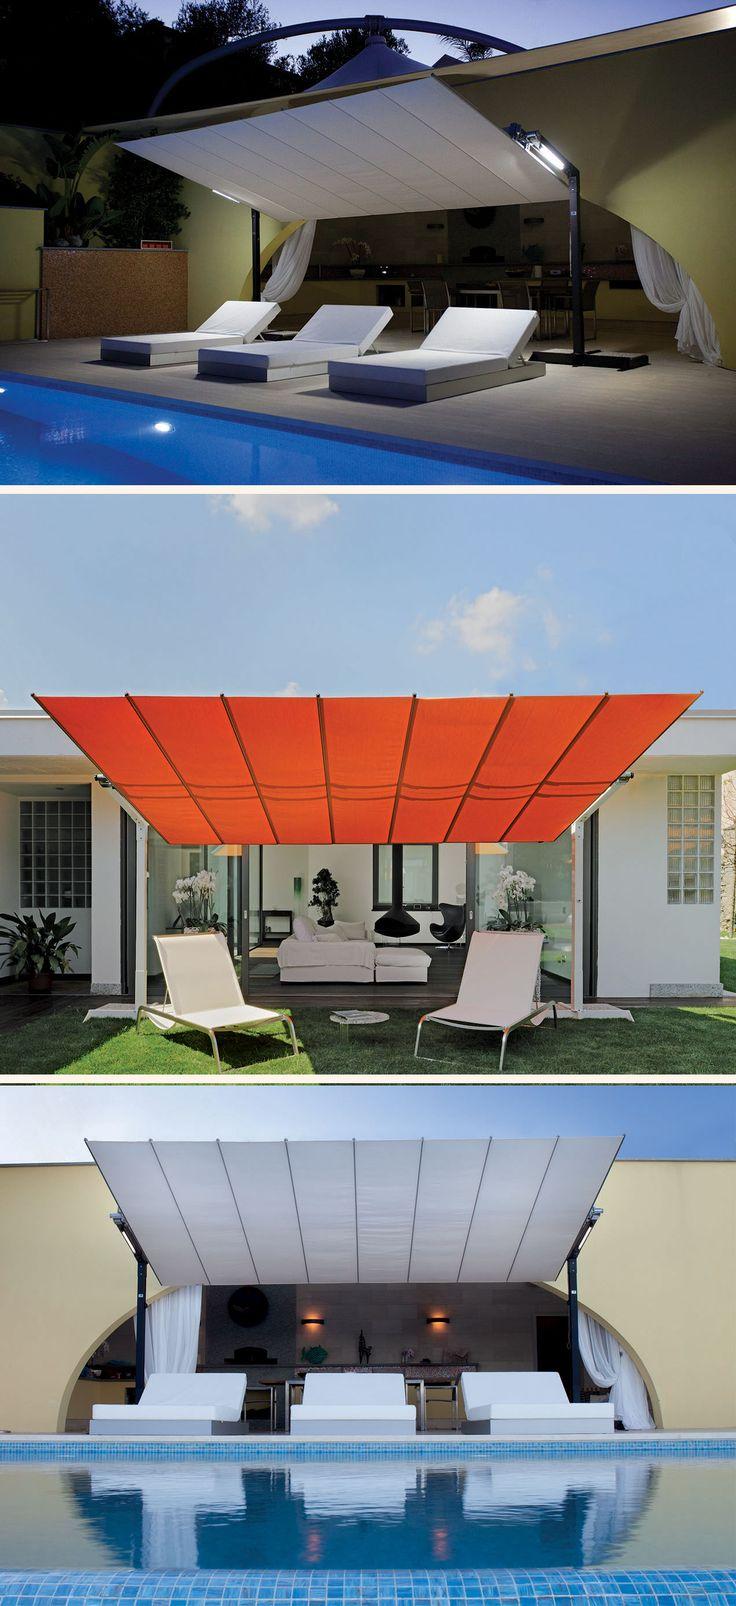 Tendasole Flexy di FIM. #arredo #giardino #ombrellone #madeinitaly